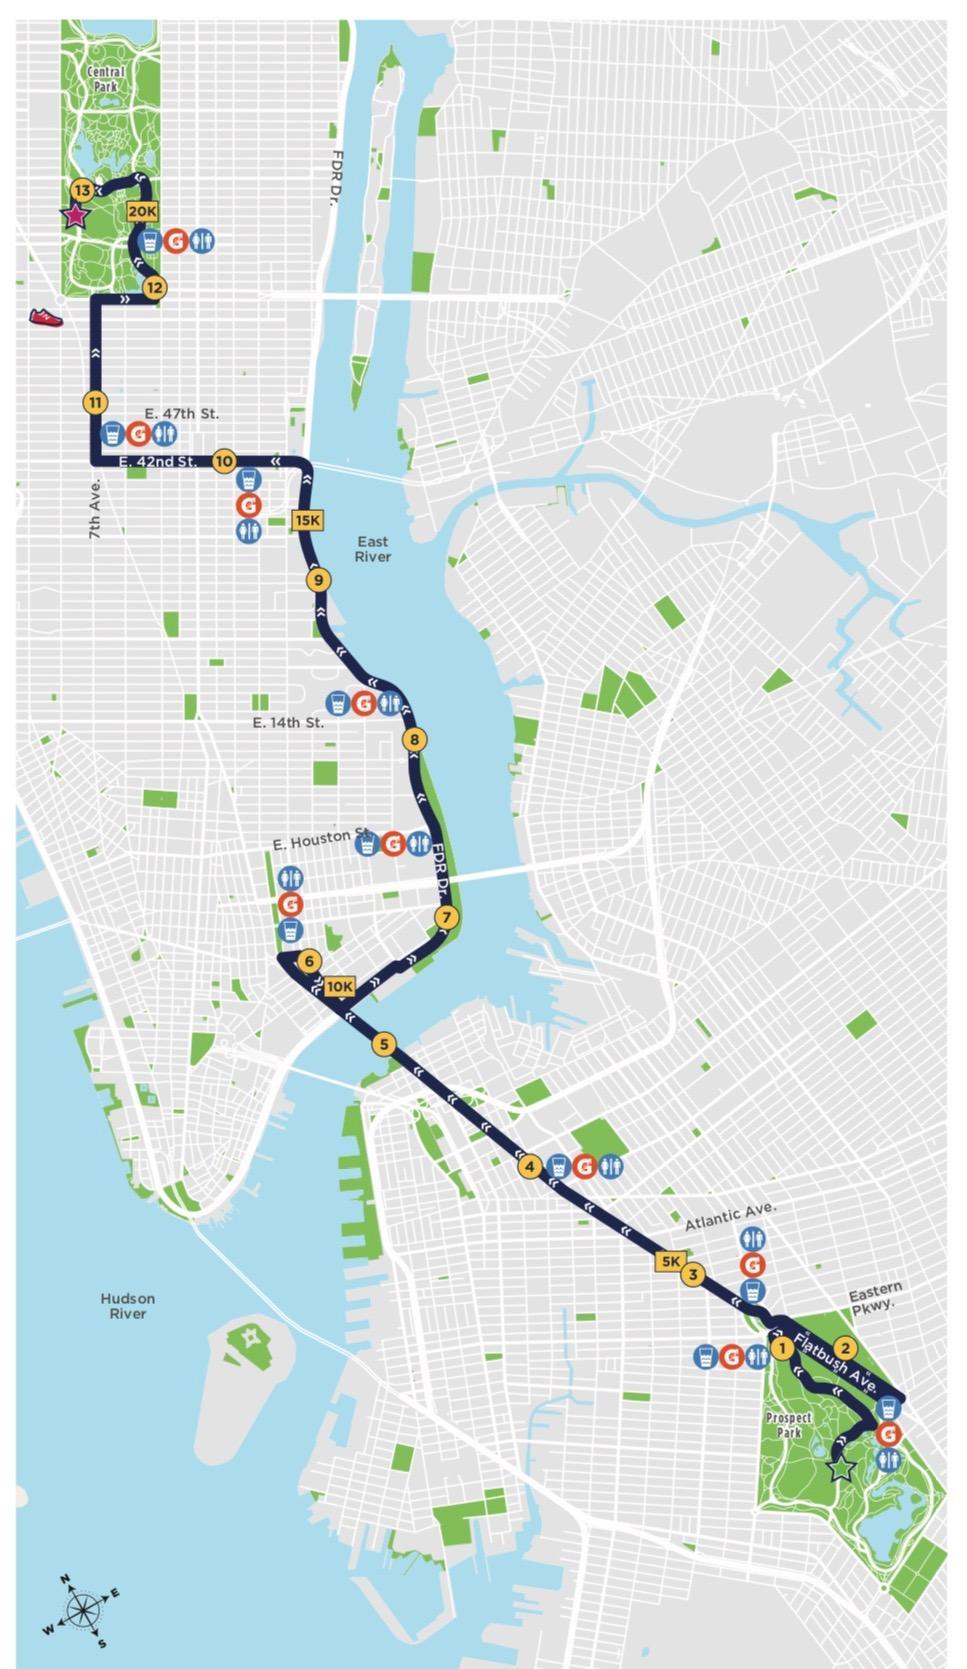 NYC-half-marathon2-BerkanaRehab.jpg